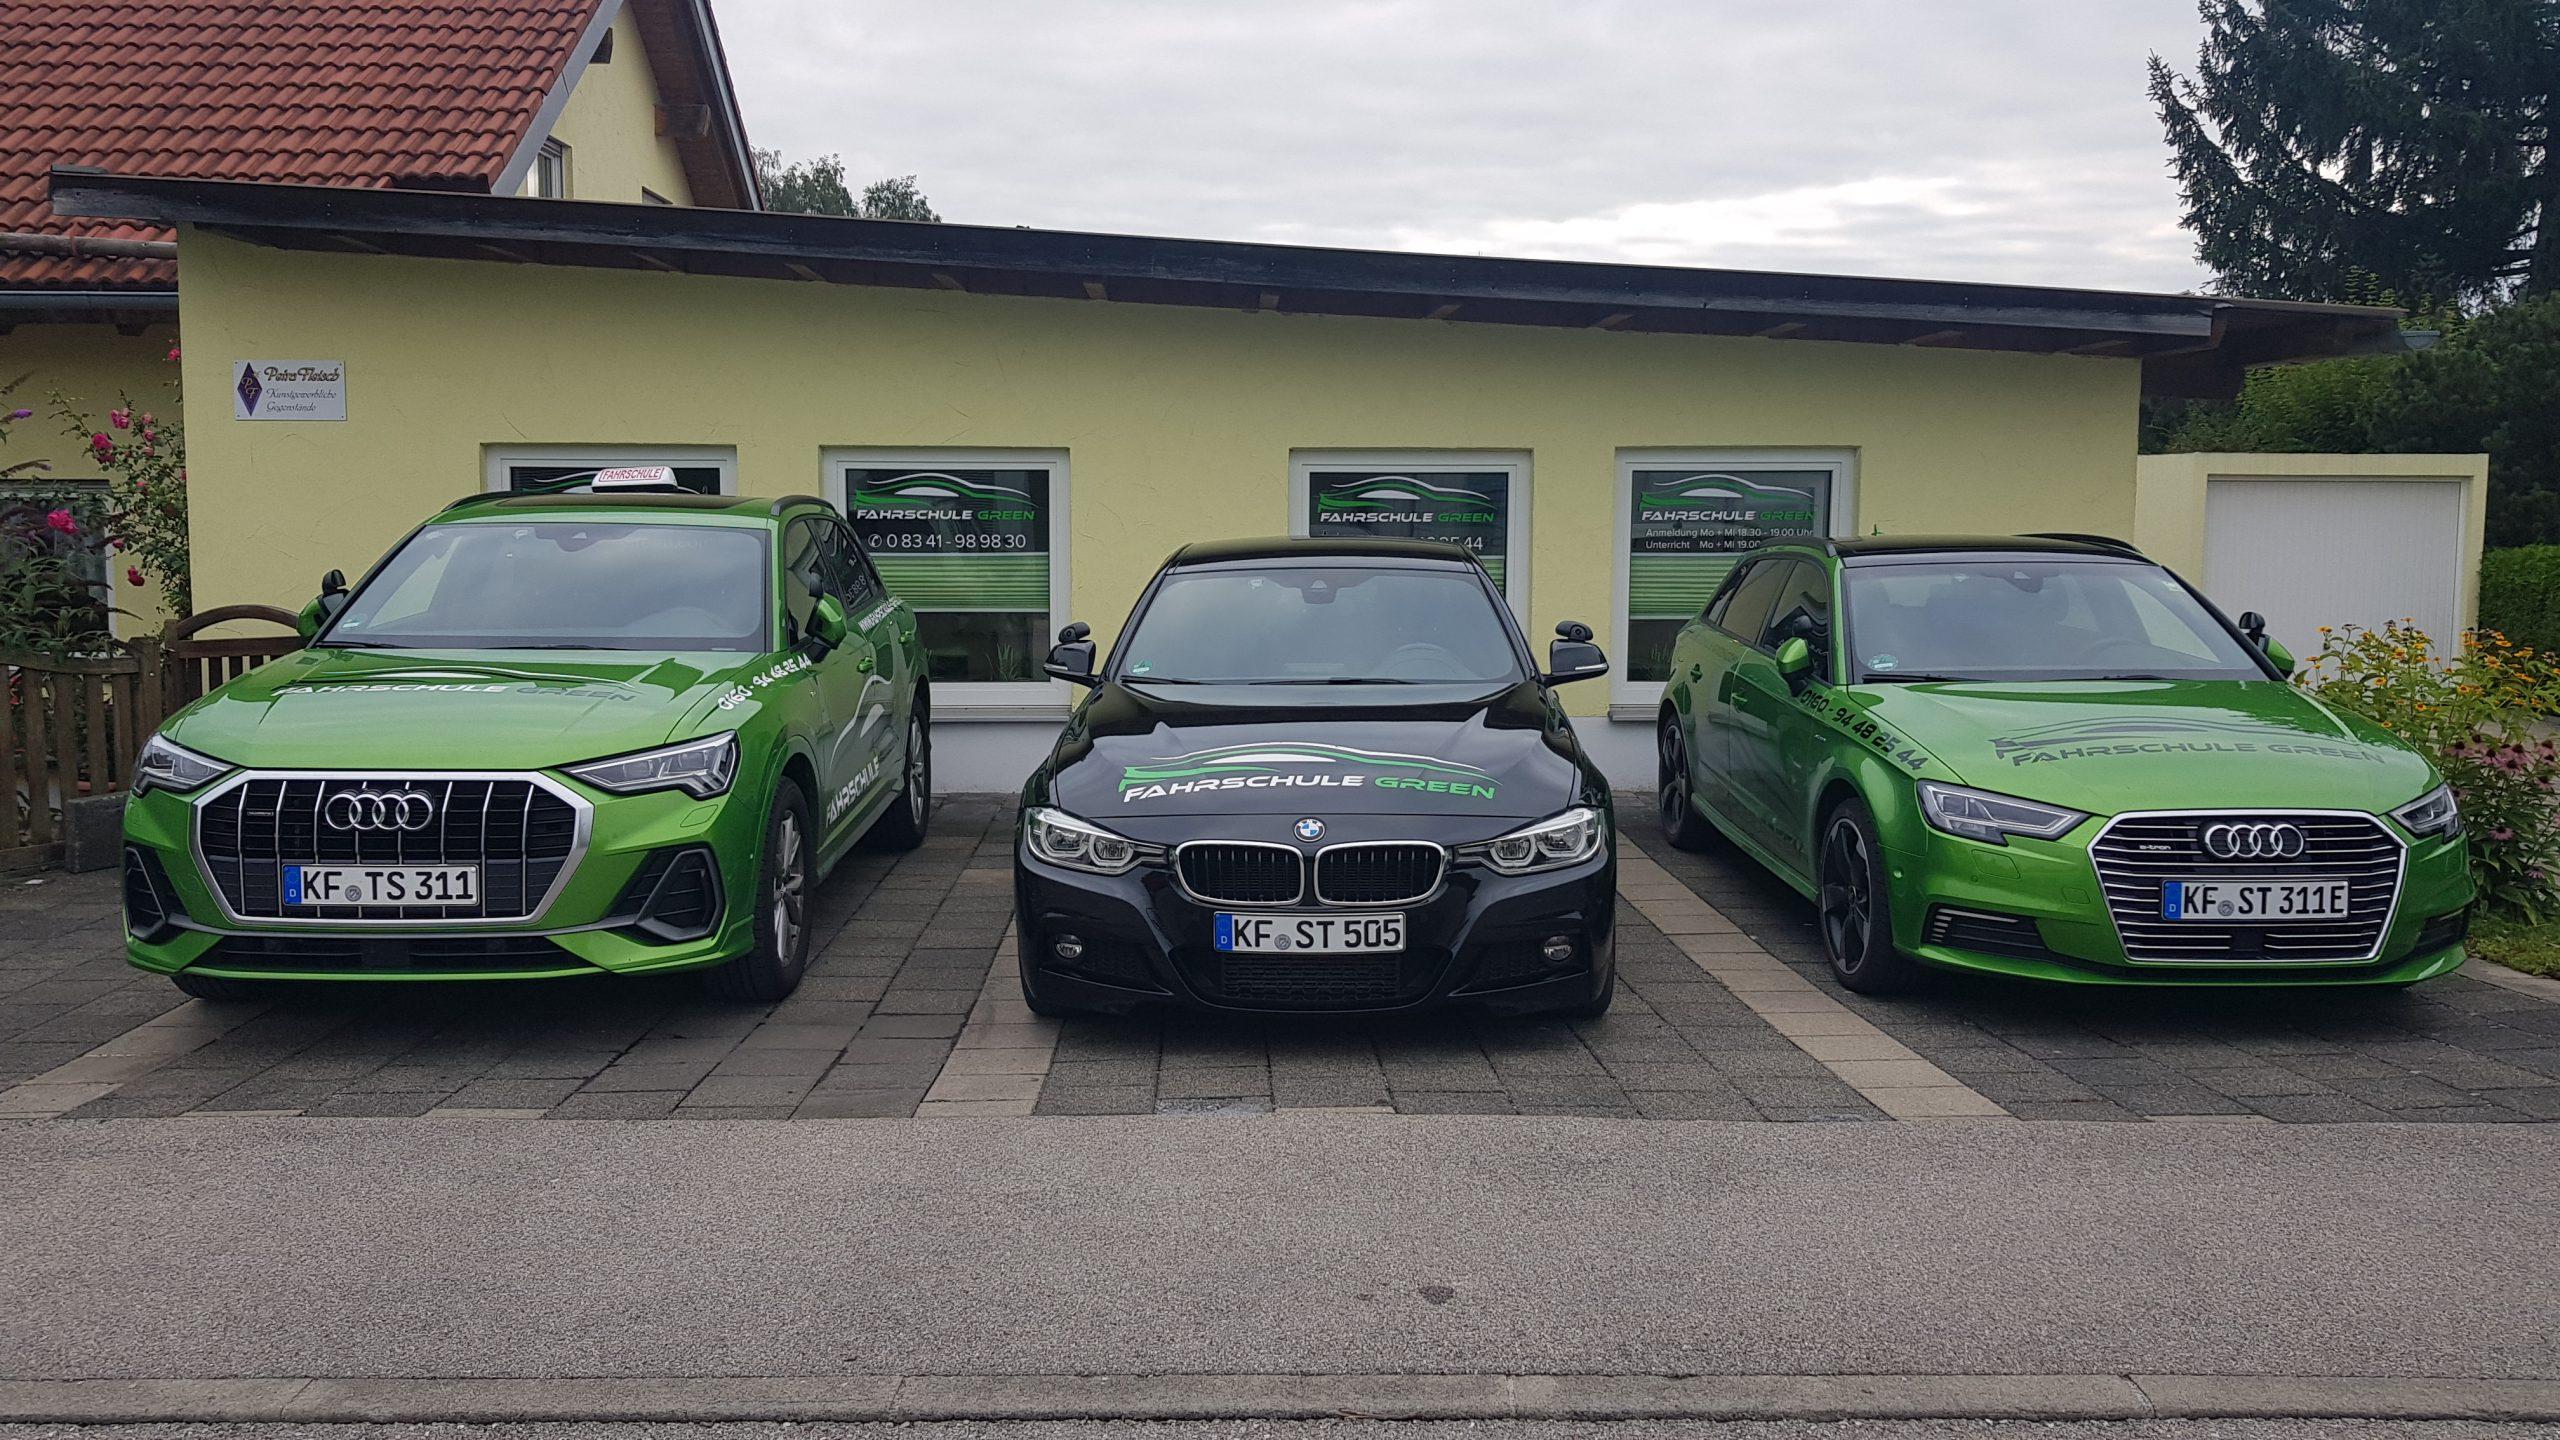 fahrschule-green-schulungsfahrzeuge-kaufbeuren-neugablonz